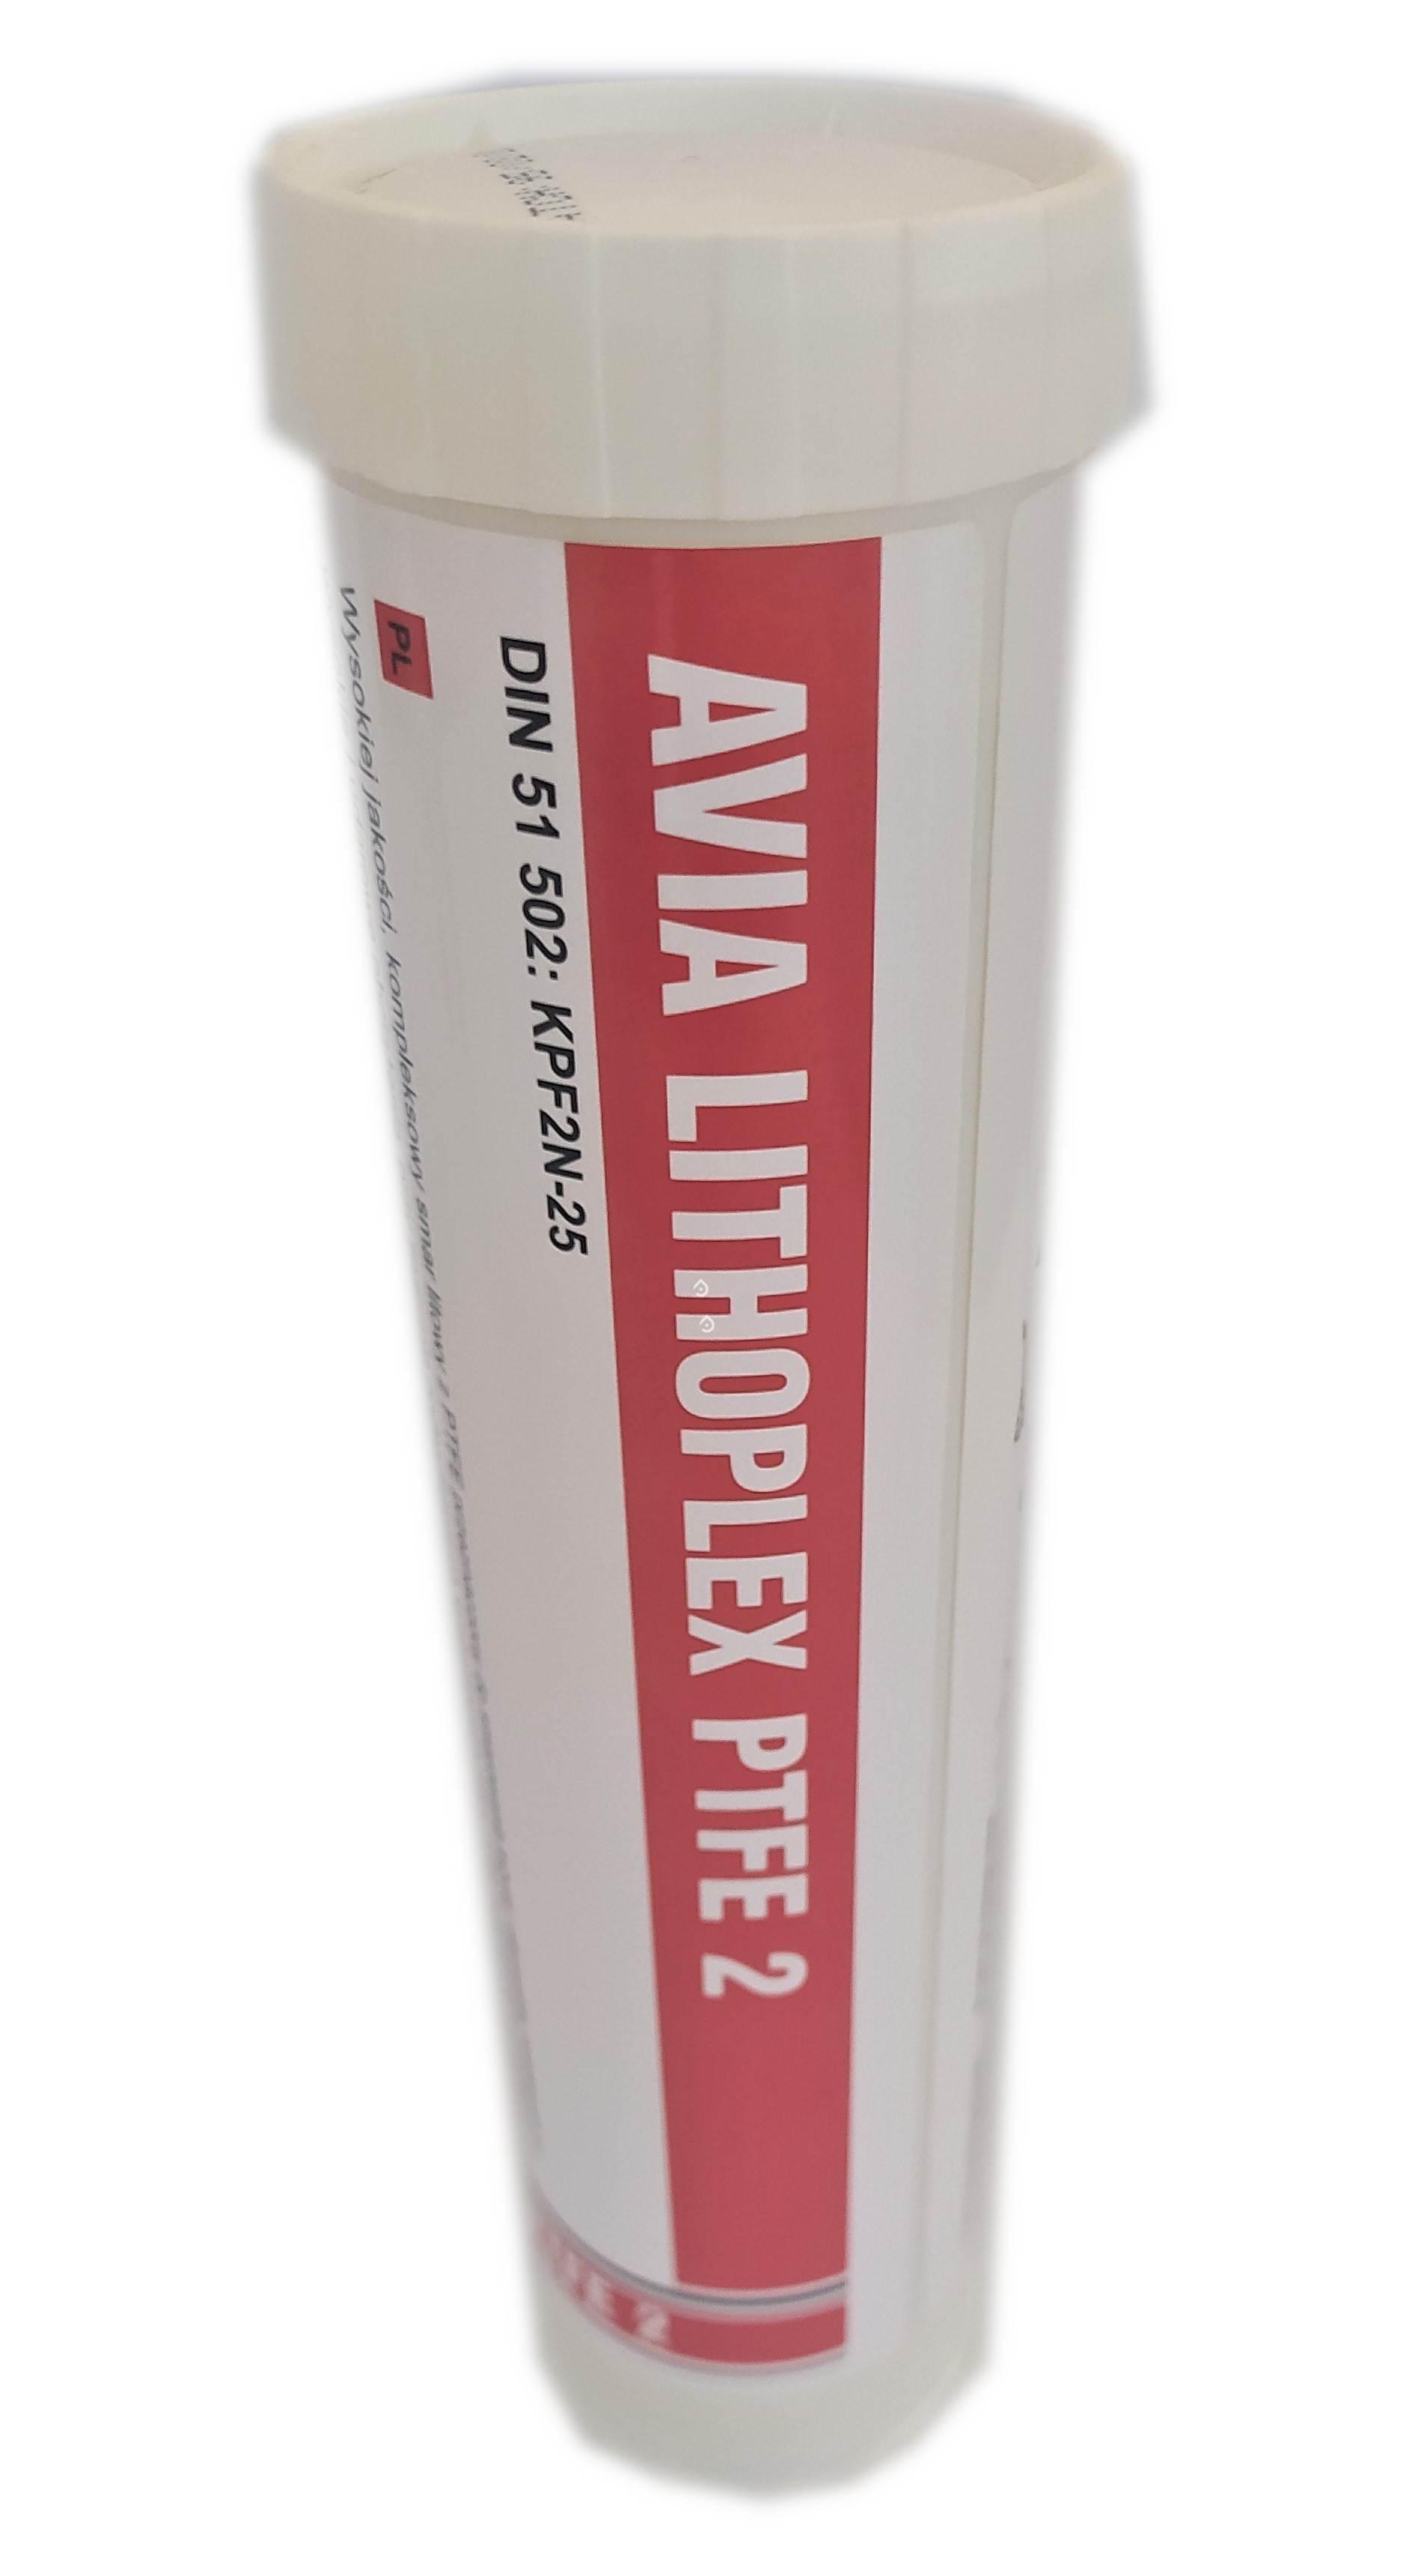 AVIA LITHOPLEX PTFE 2 0,4KG.